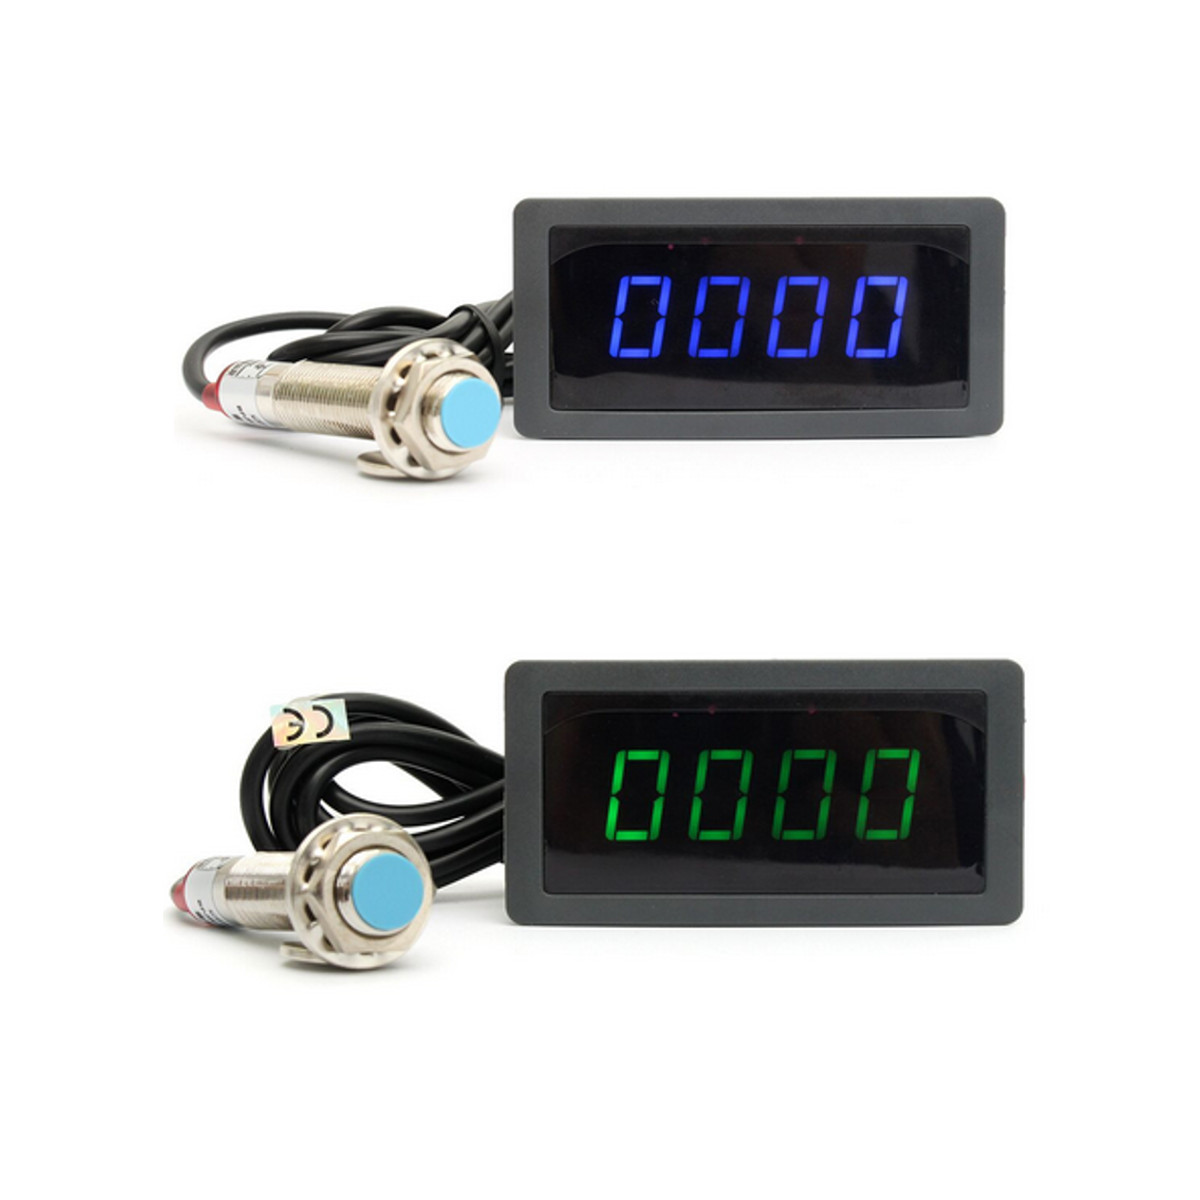 Blue Green 4 Digital LED Tachometer RPM Speed Meter+Proximity Switch Sensor 12V Promotion